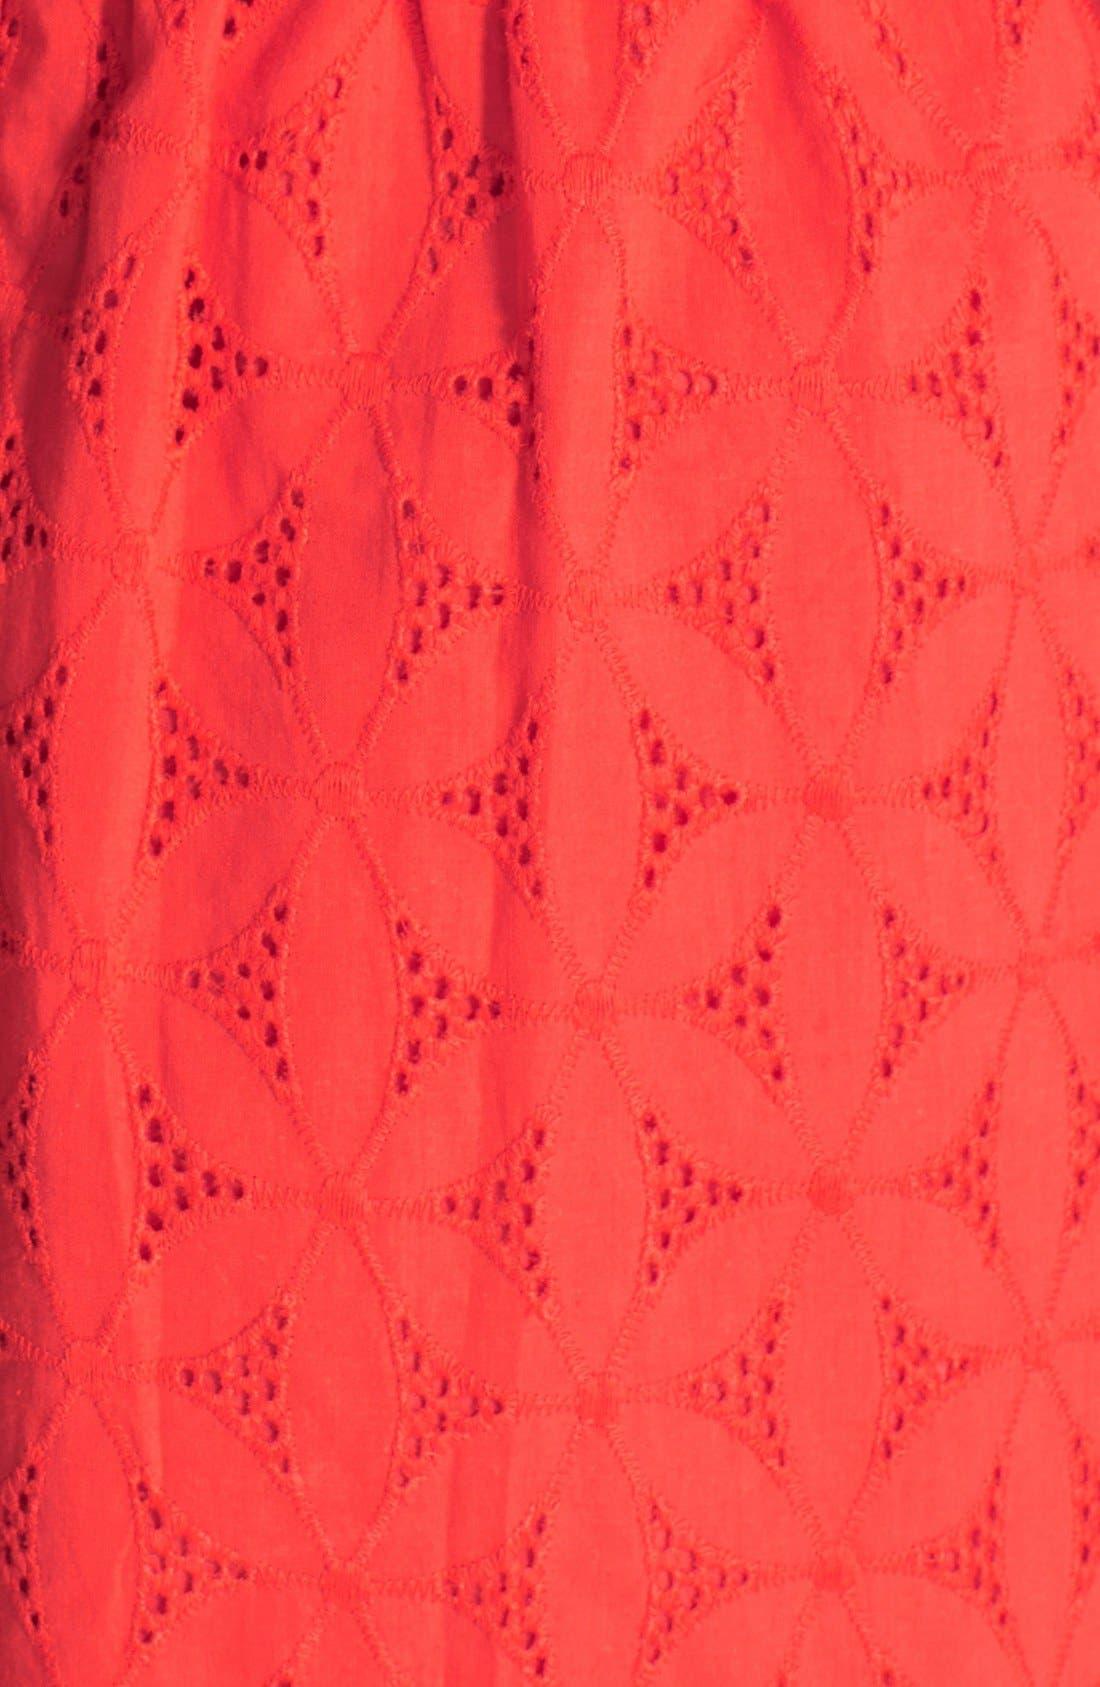 Alternate Image 3  - kensie Embroidered Eyelet Cotton Fit & Flare Dress